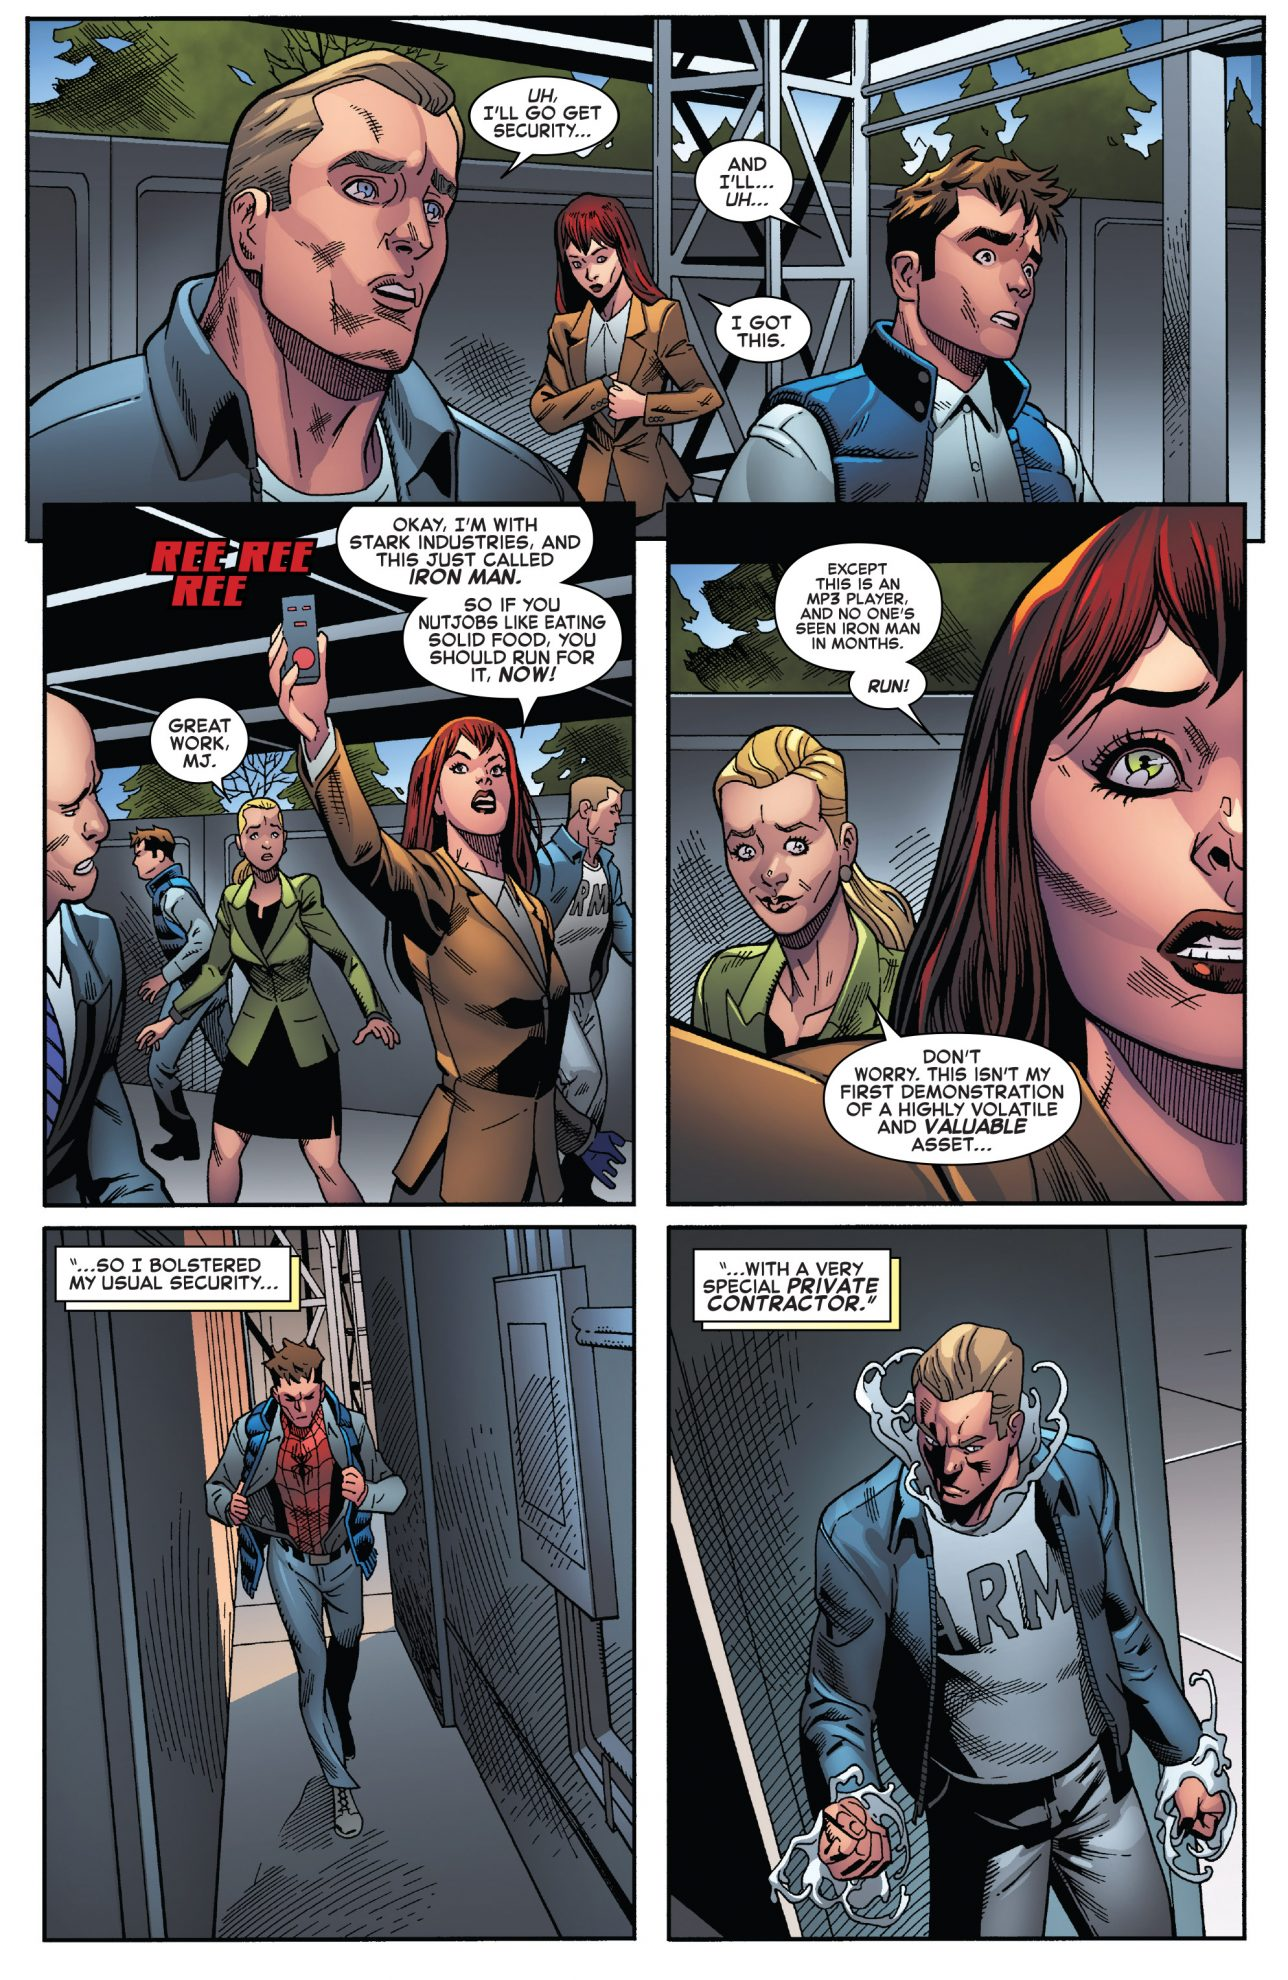 spider man and agent anti venom vs goblin king comicnewbies